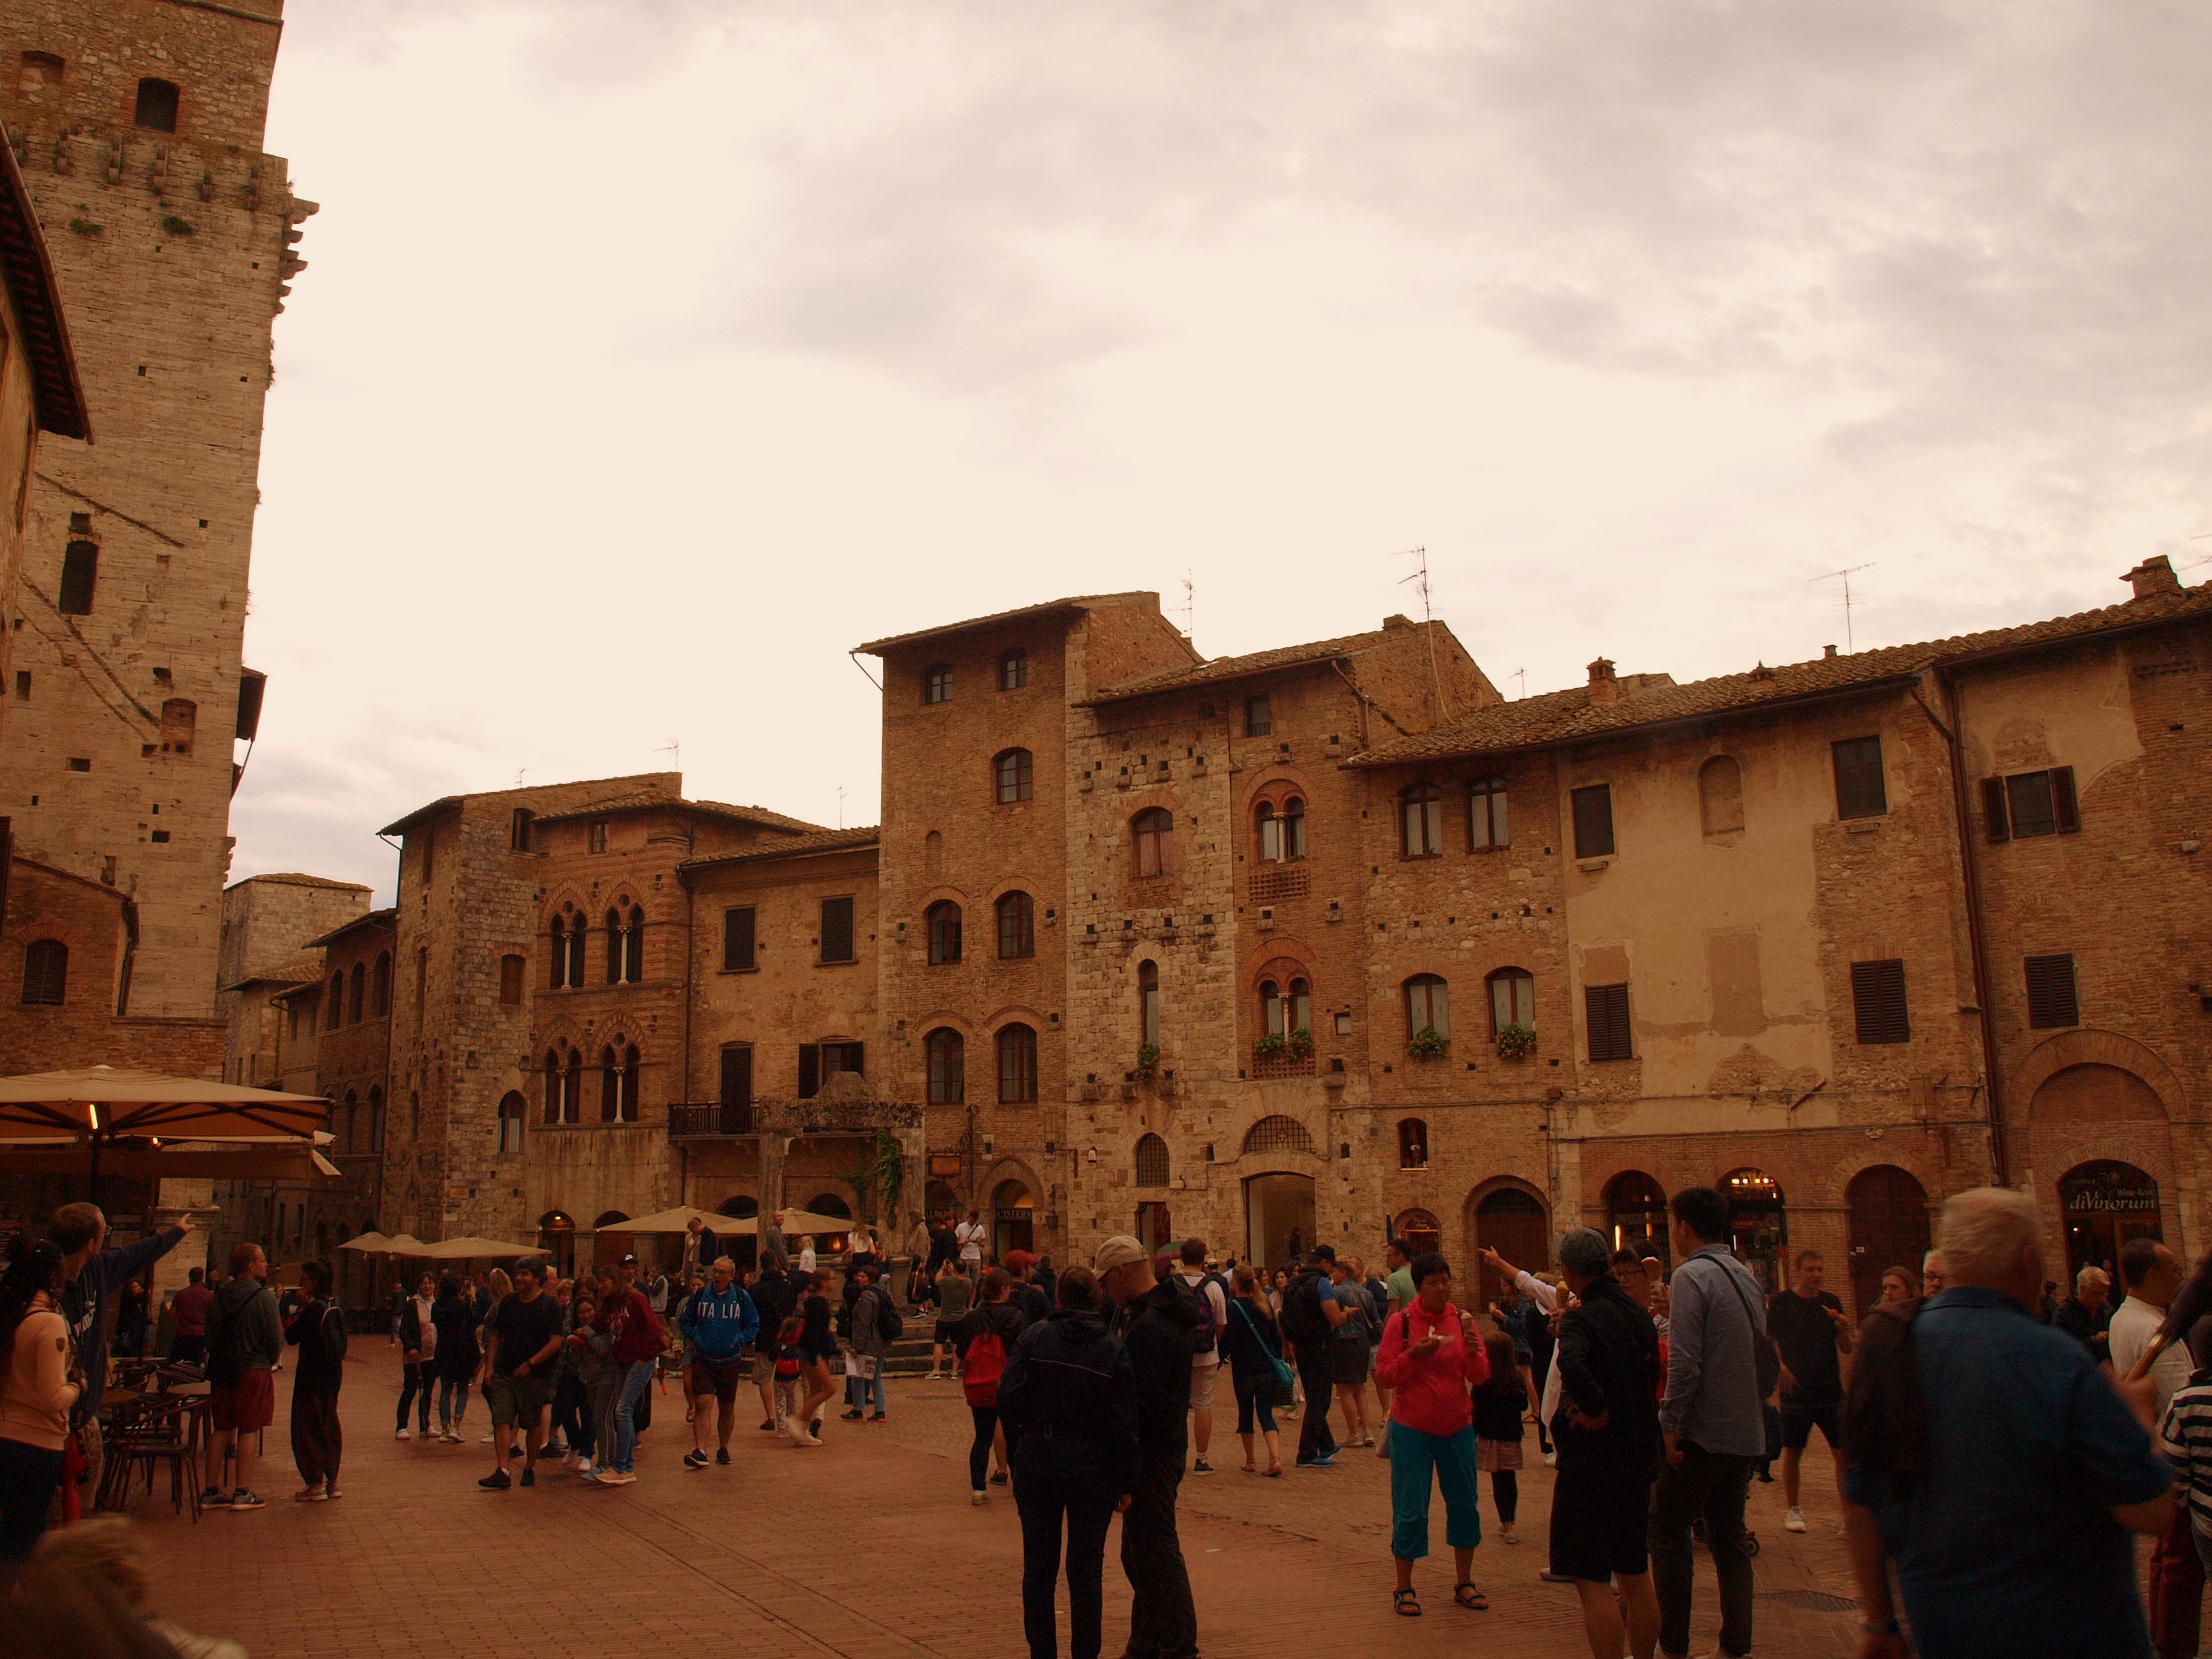 San Giminiano 2